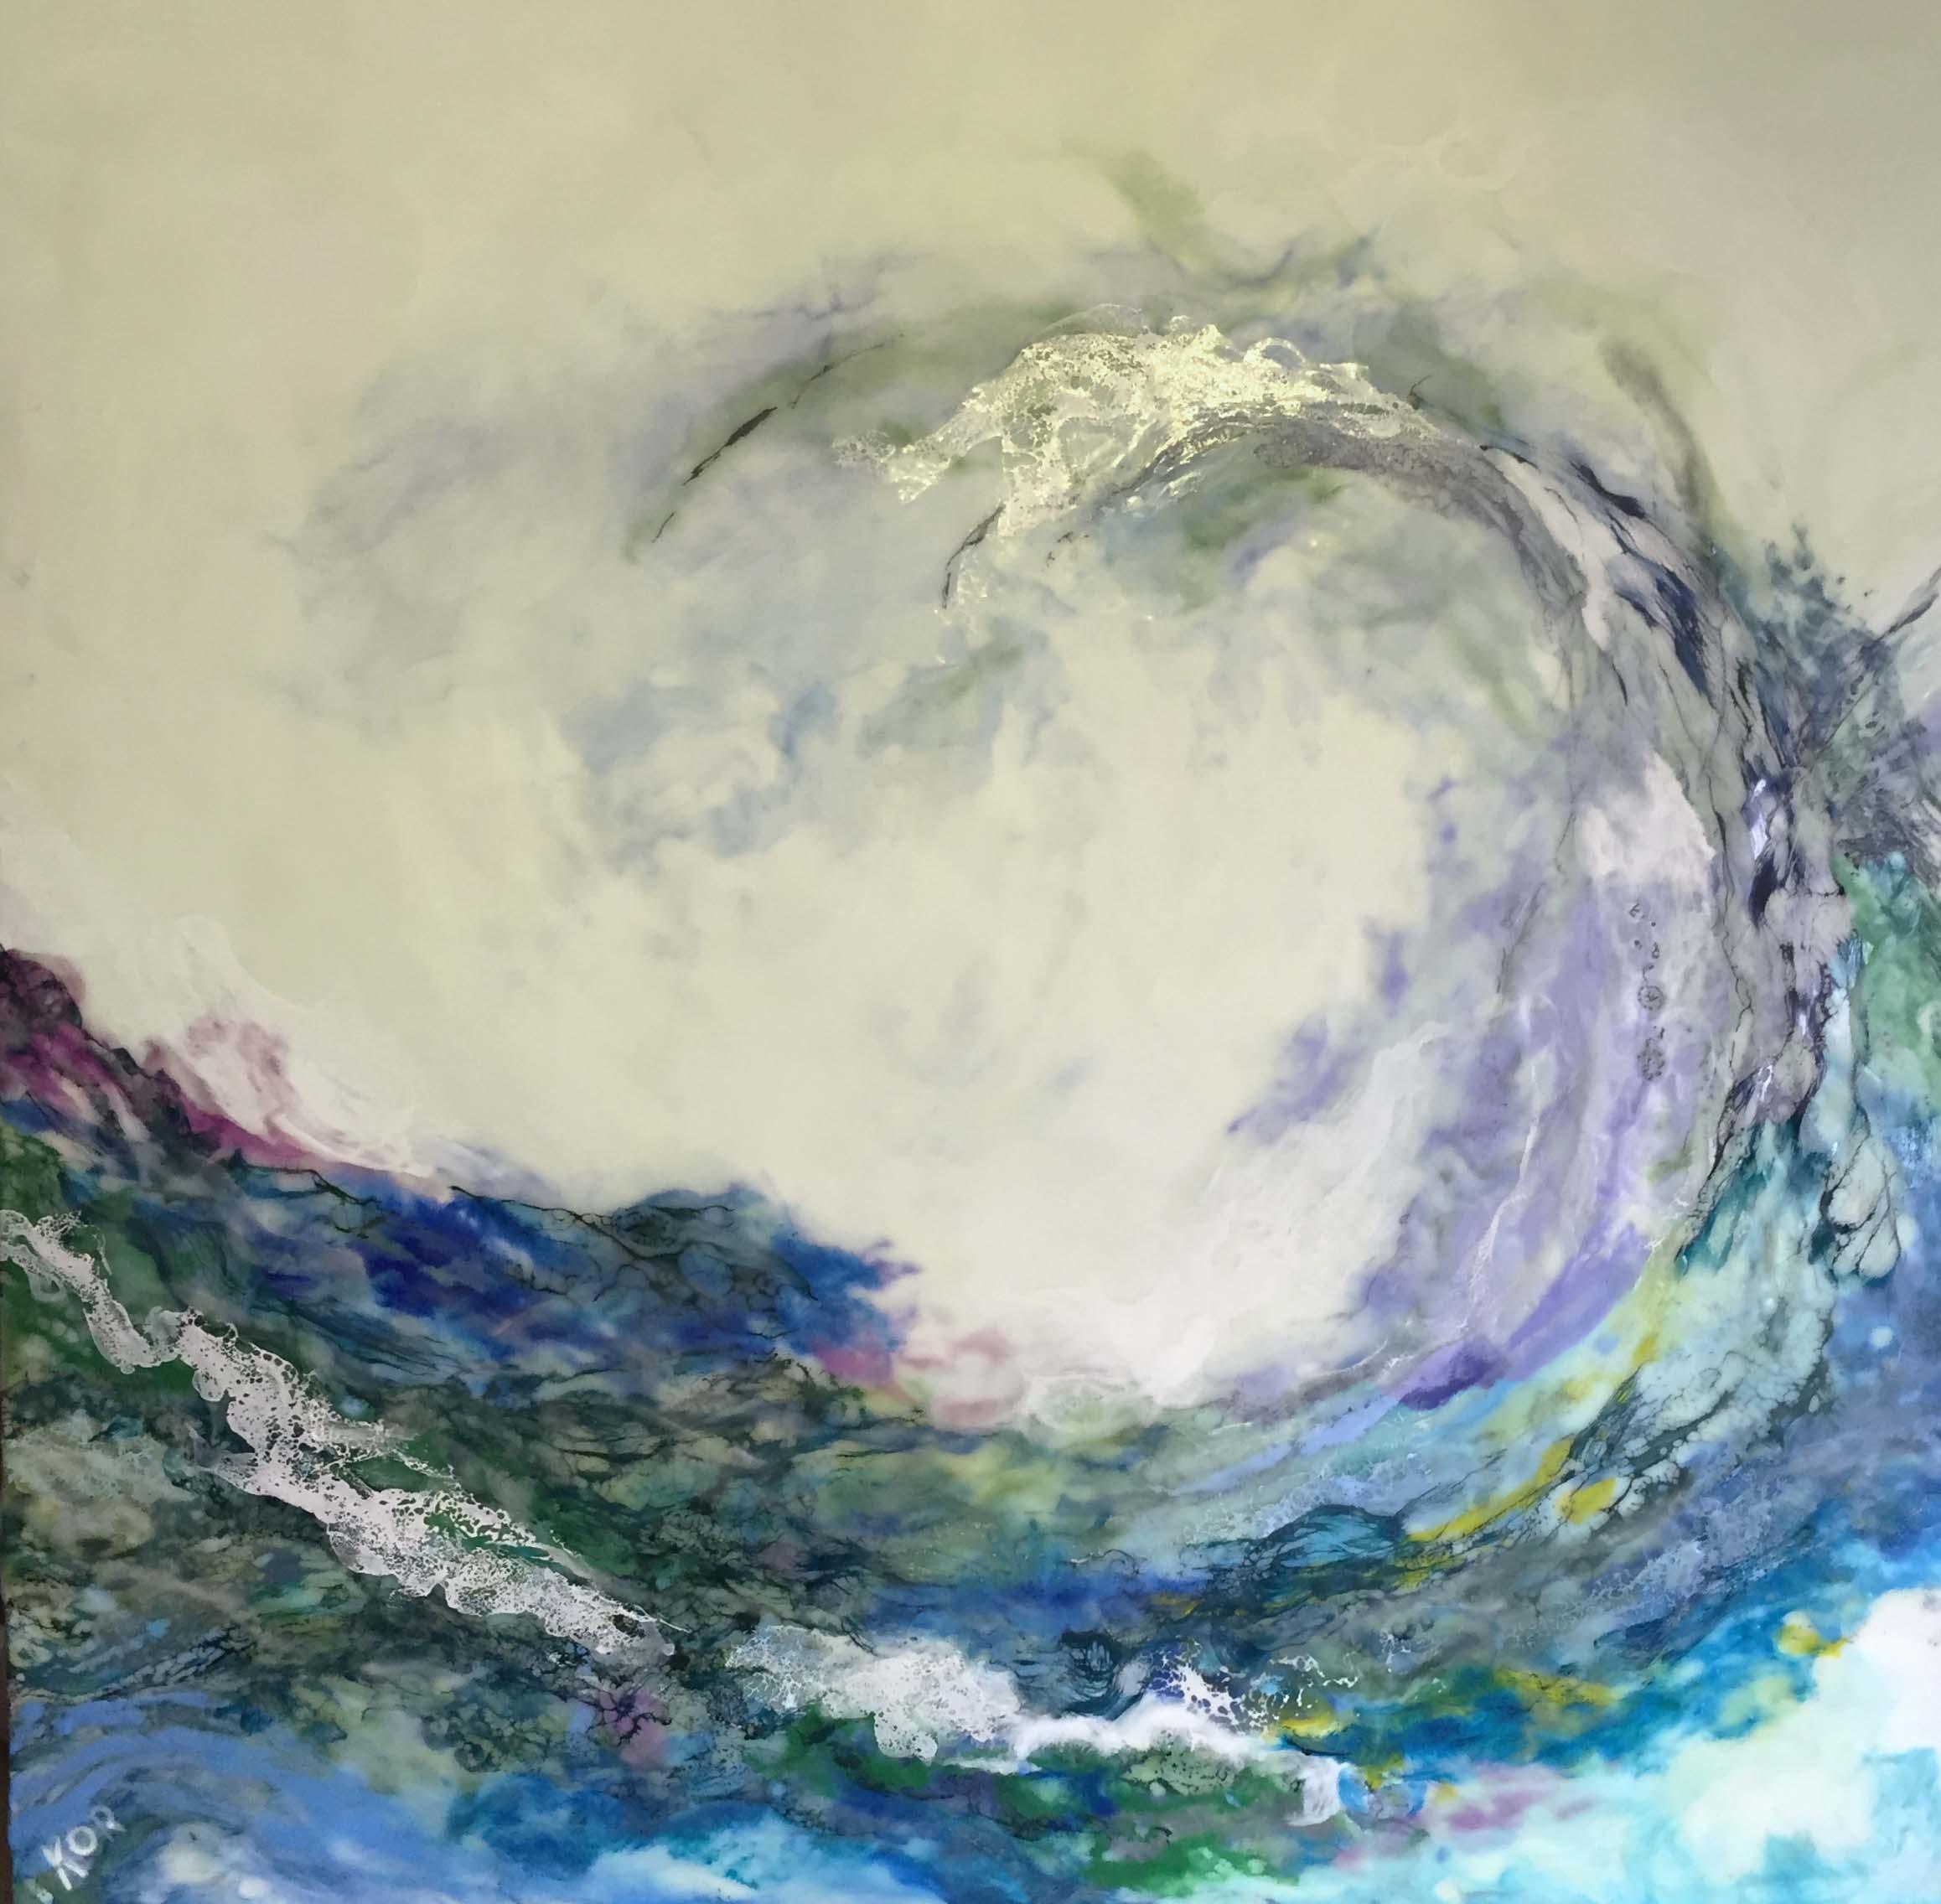 """Wave Crest""                                                                 Encaustic on Birch Panel                                                         30 x 30 ($2000.00)"